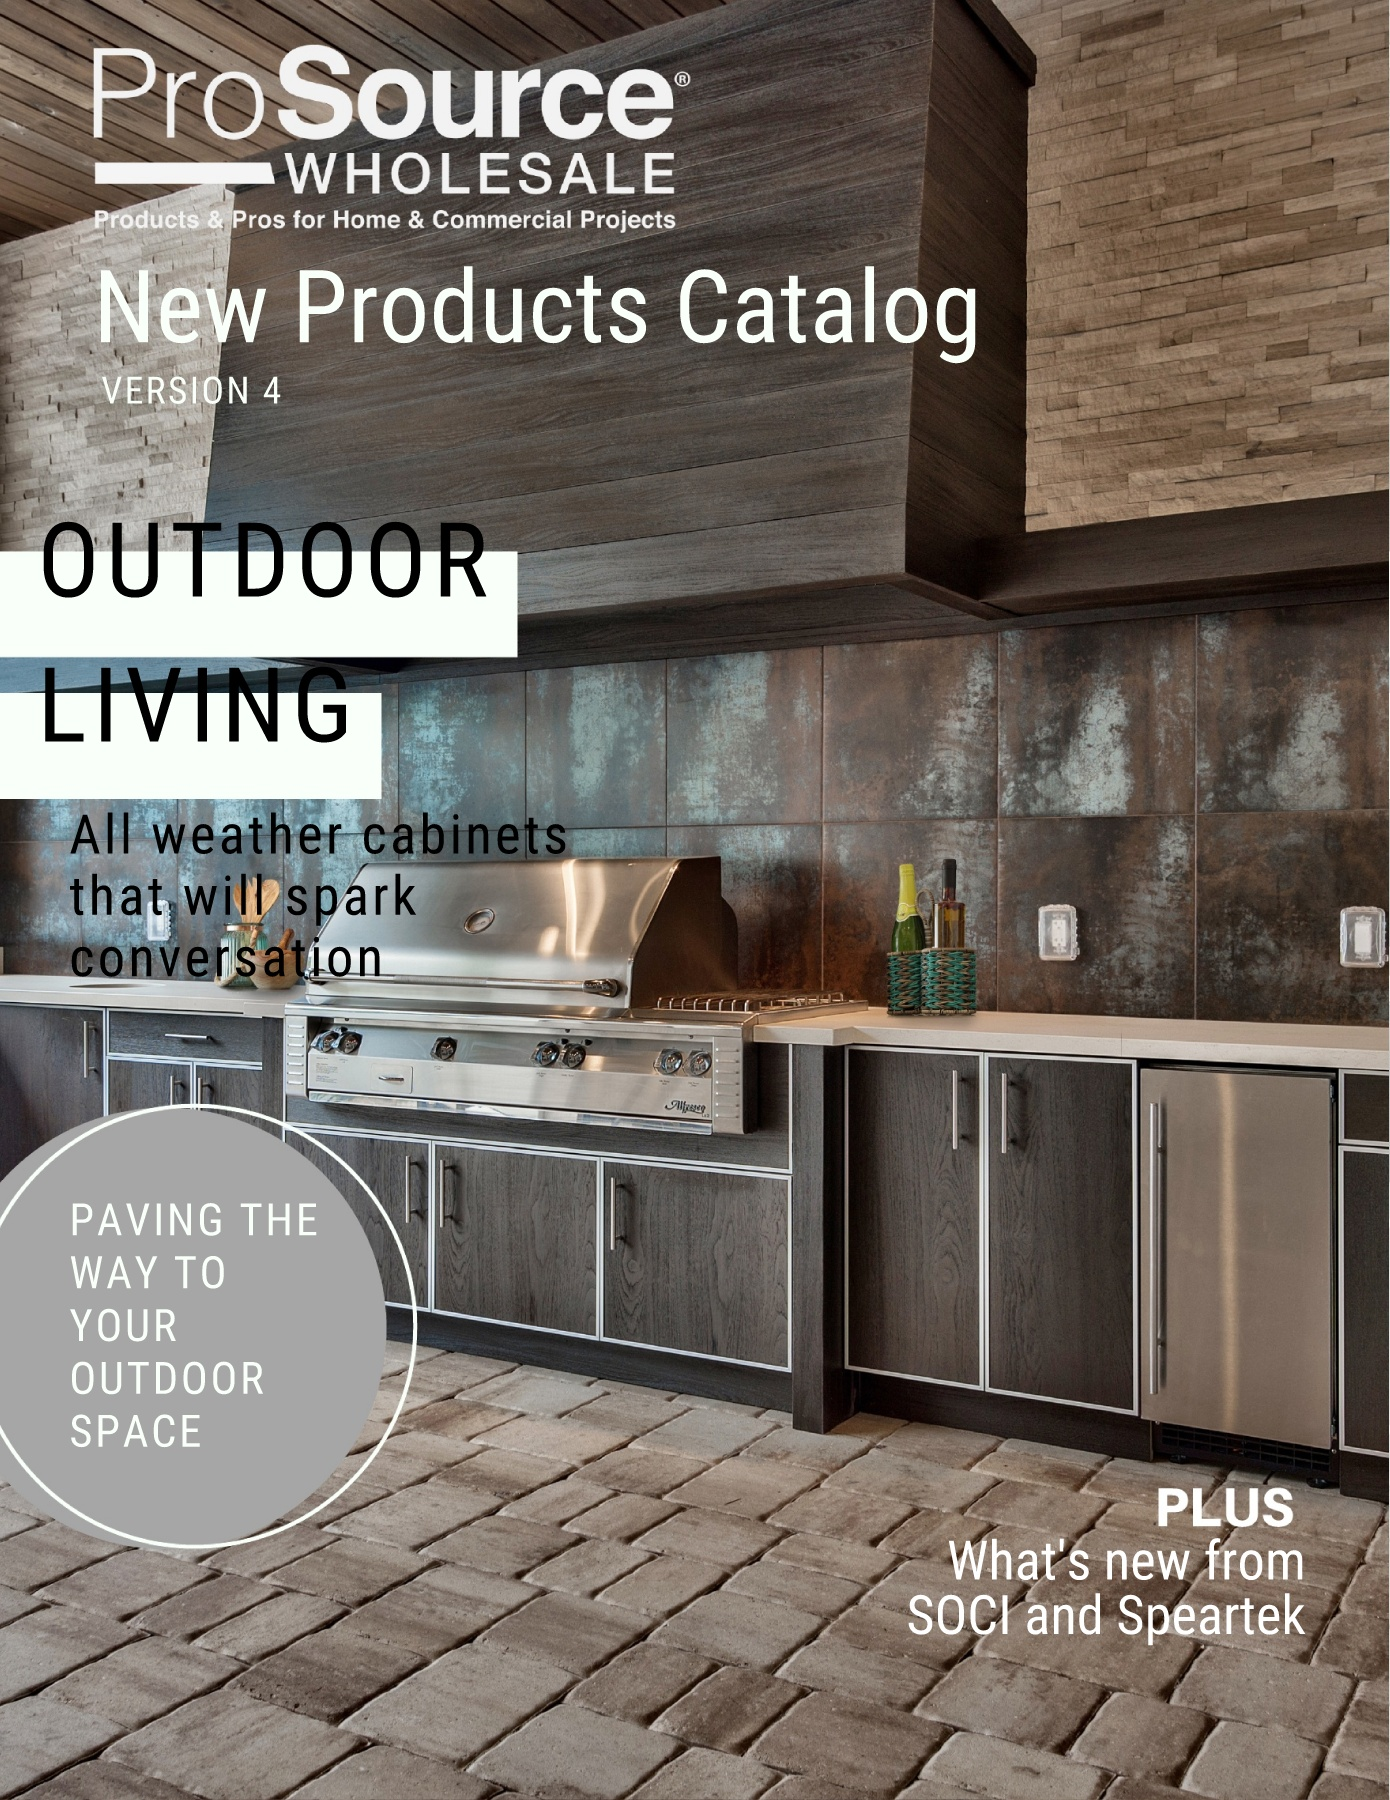 prosource new products catalog v3